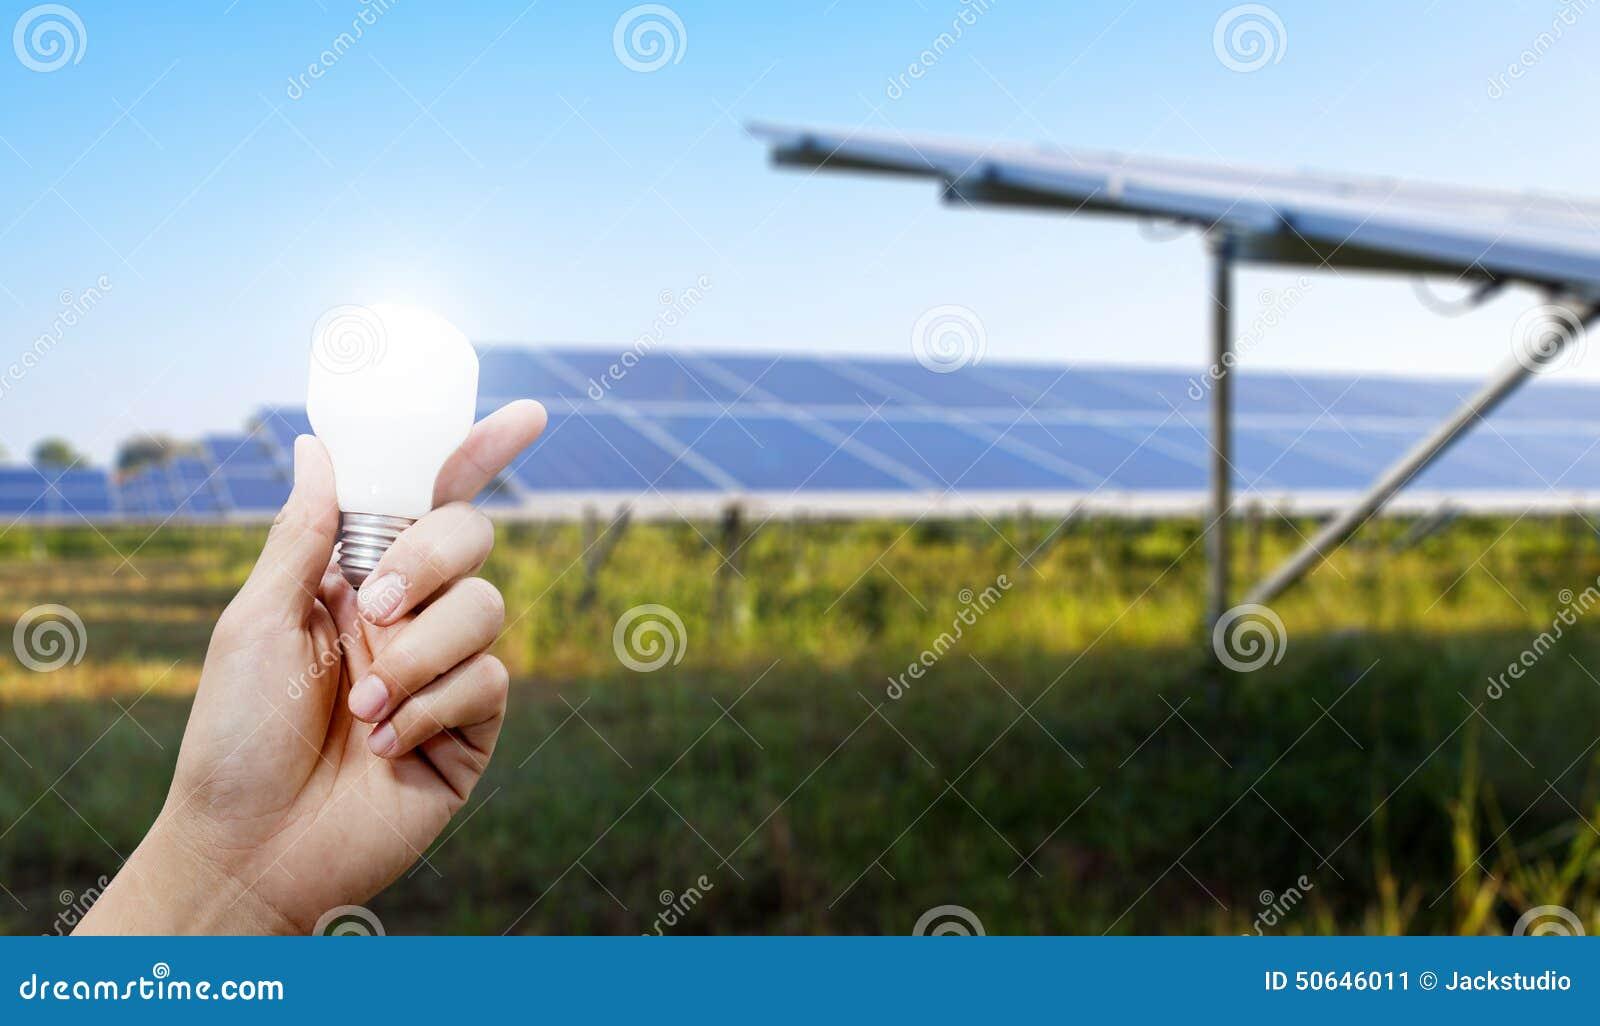 Solar Energy Panels And Light Bulb In Hand Energy Stock